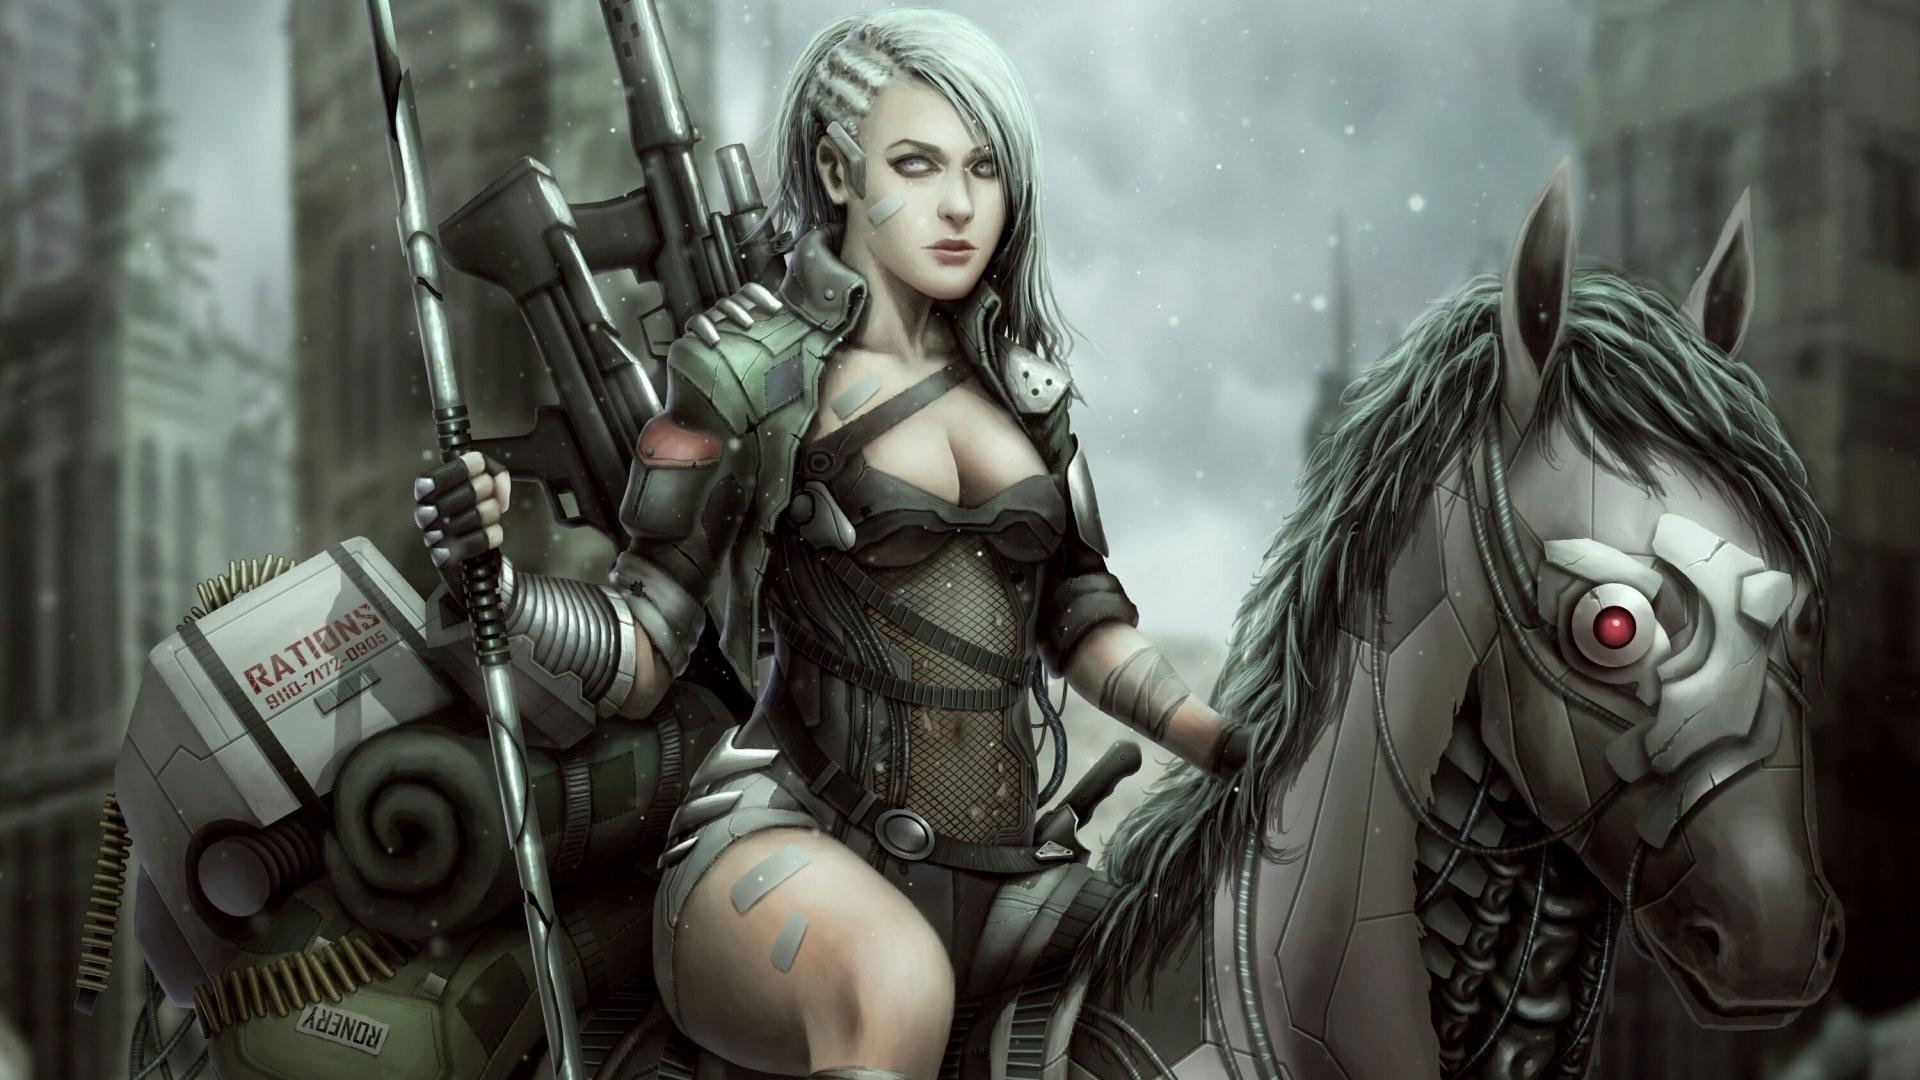 Fantasy Women Warrior Fallout 4 Horse Robot Woman Warrior White Hair Post  Apocalyptic Wallpaper